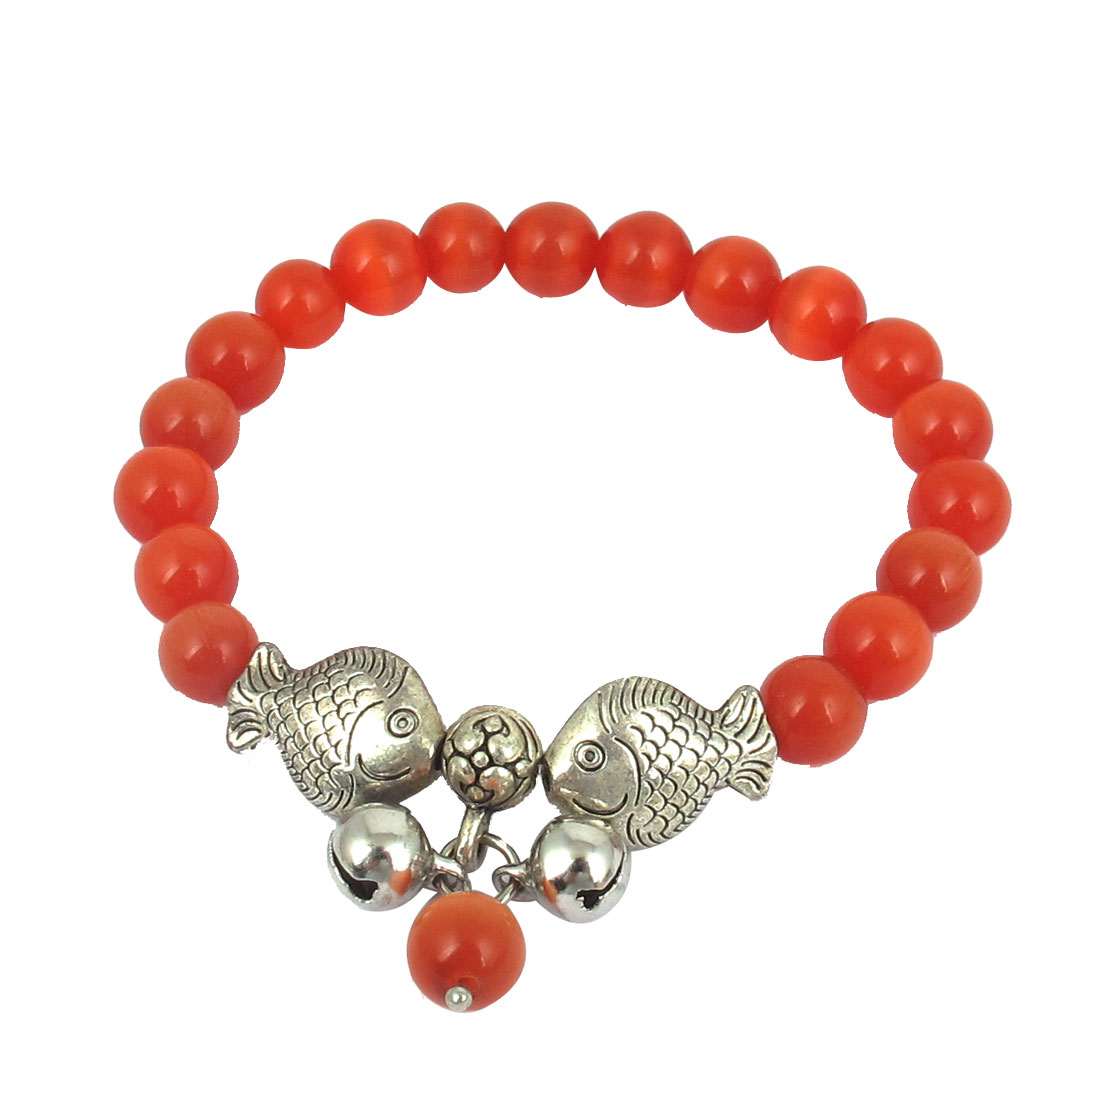 Fish Detail Round Opal Bead Wrist Ornament Bangle Bracelet Brick Red Silver Tone for Women